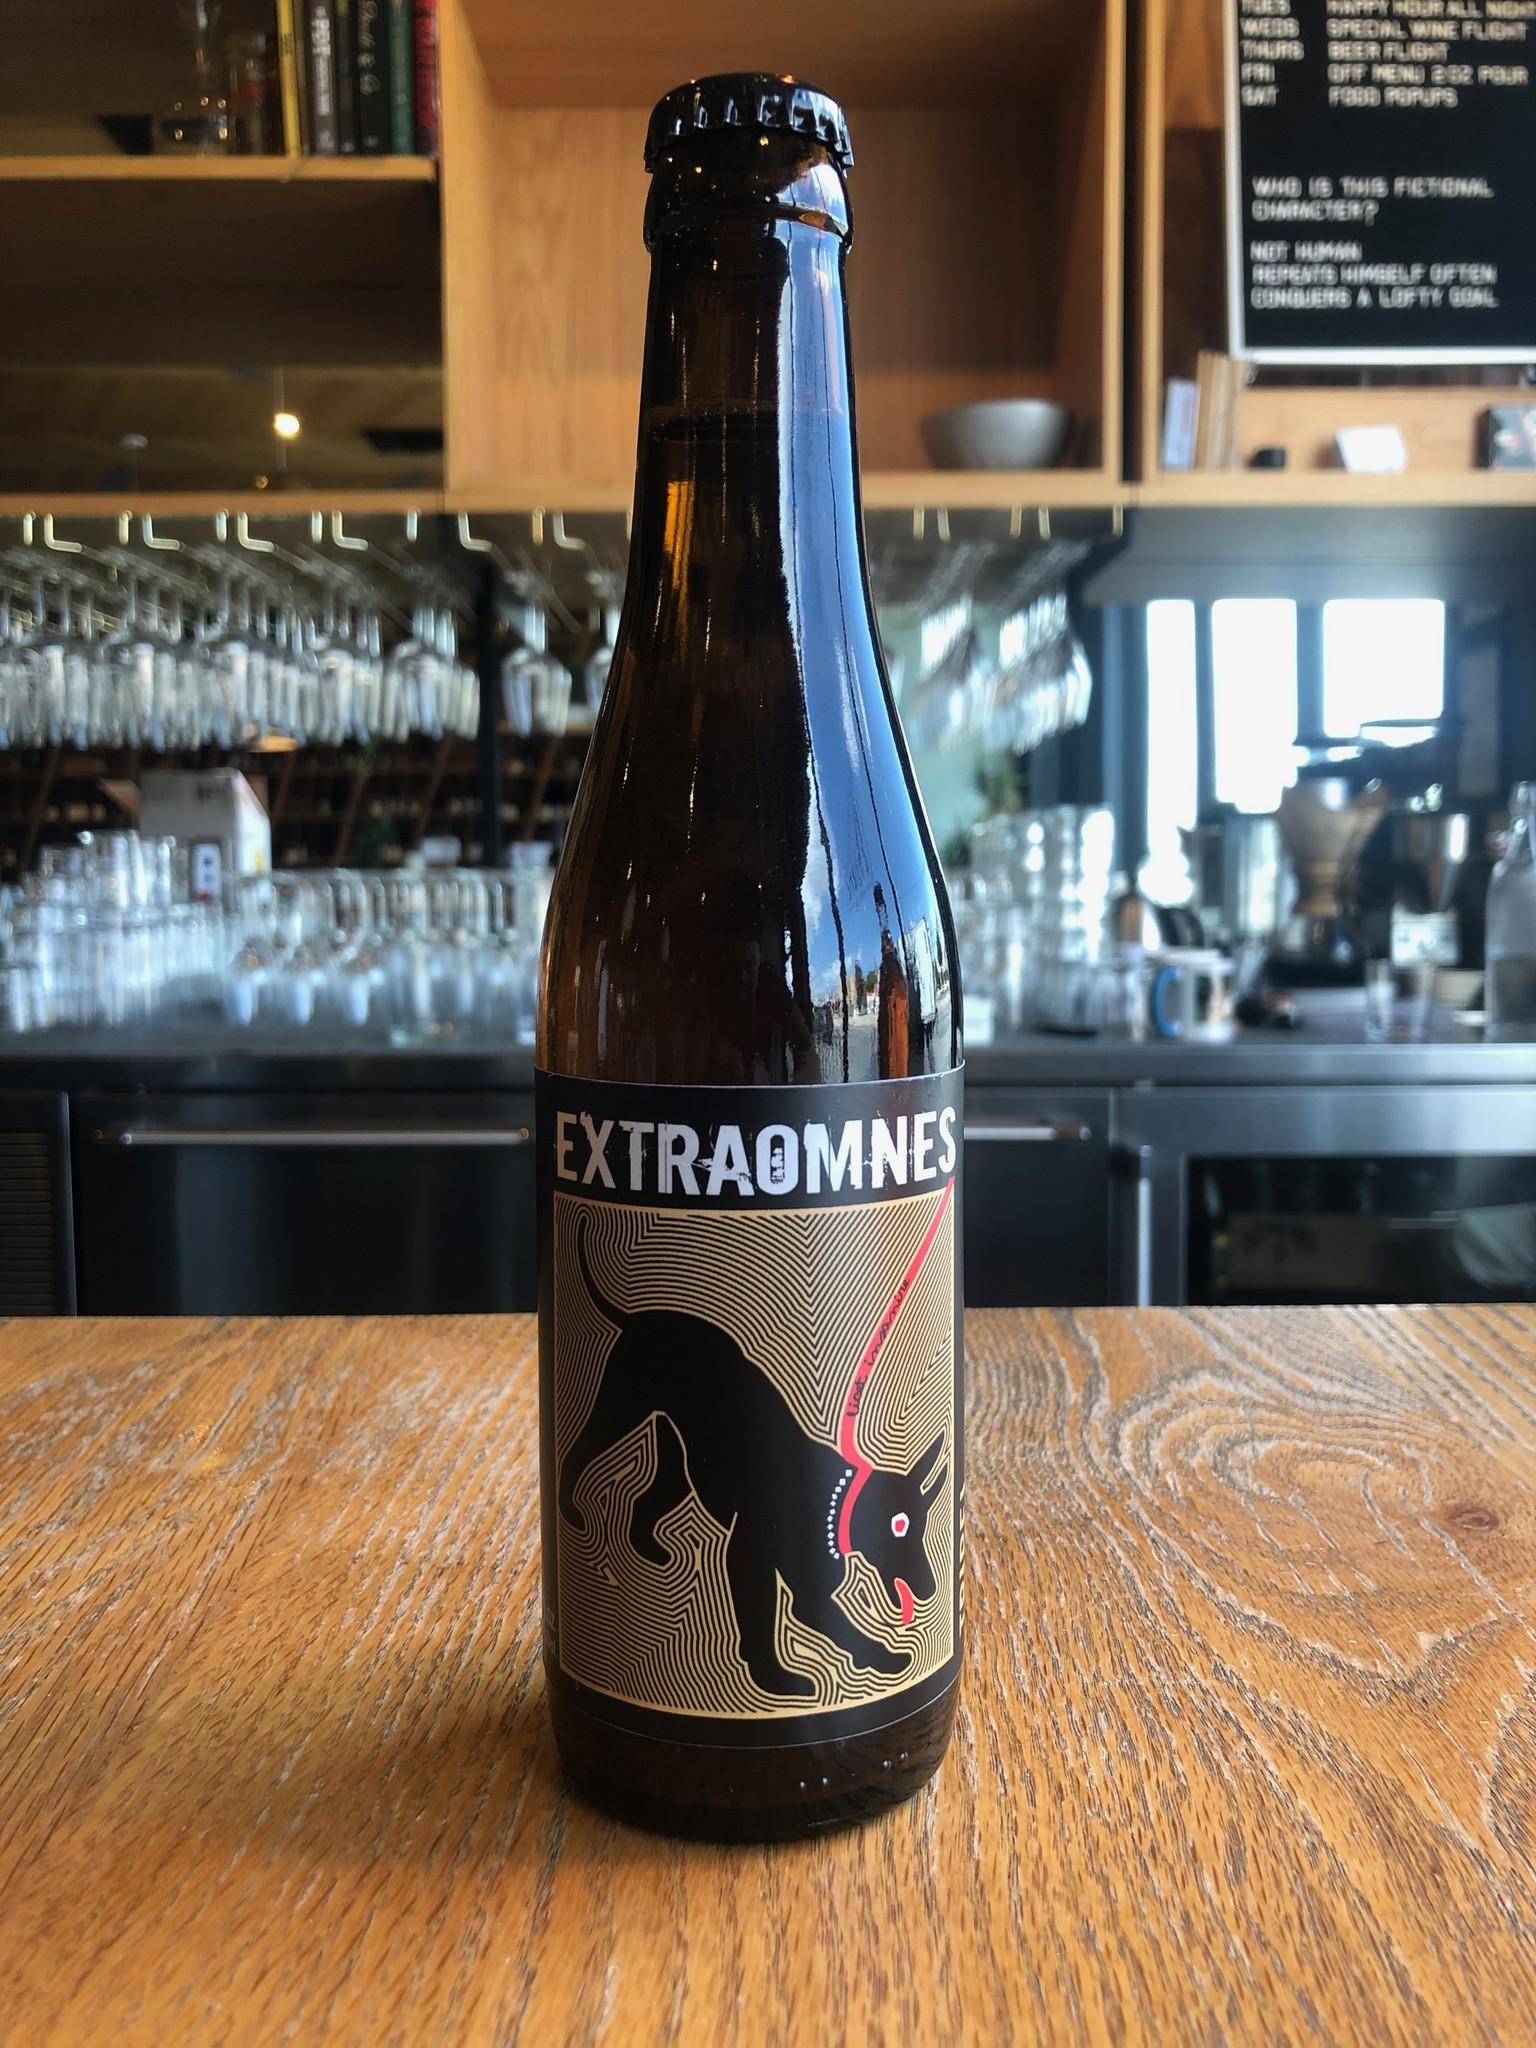 Extraomnes Extraomnes Belgian Tripel 11.2oz